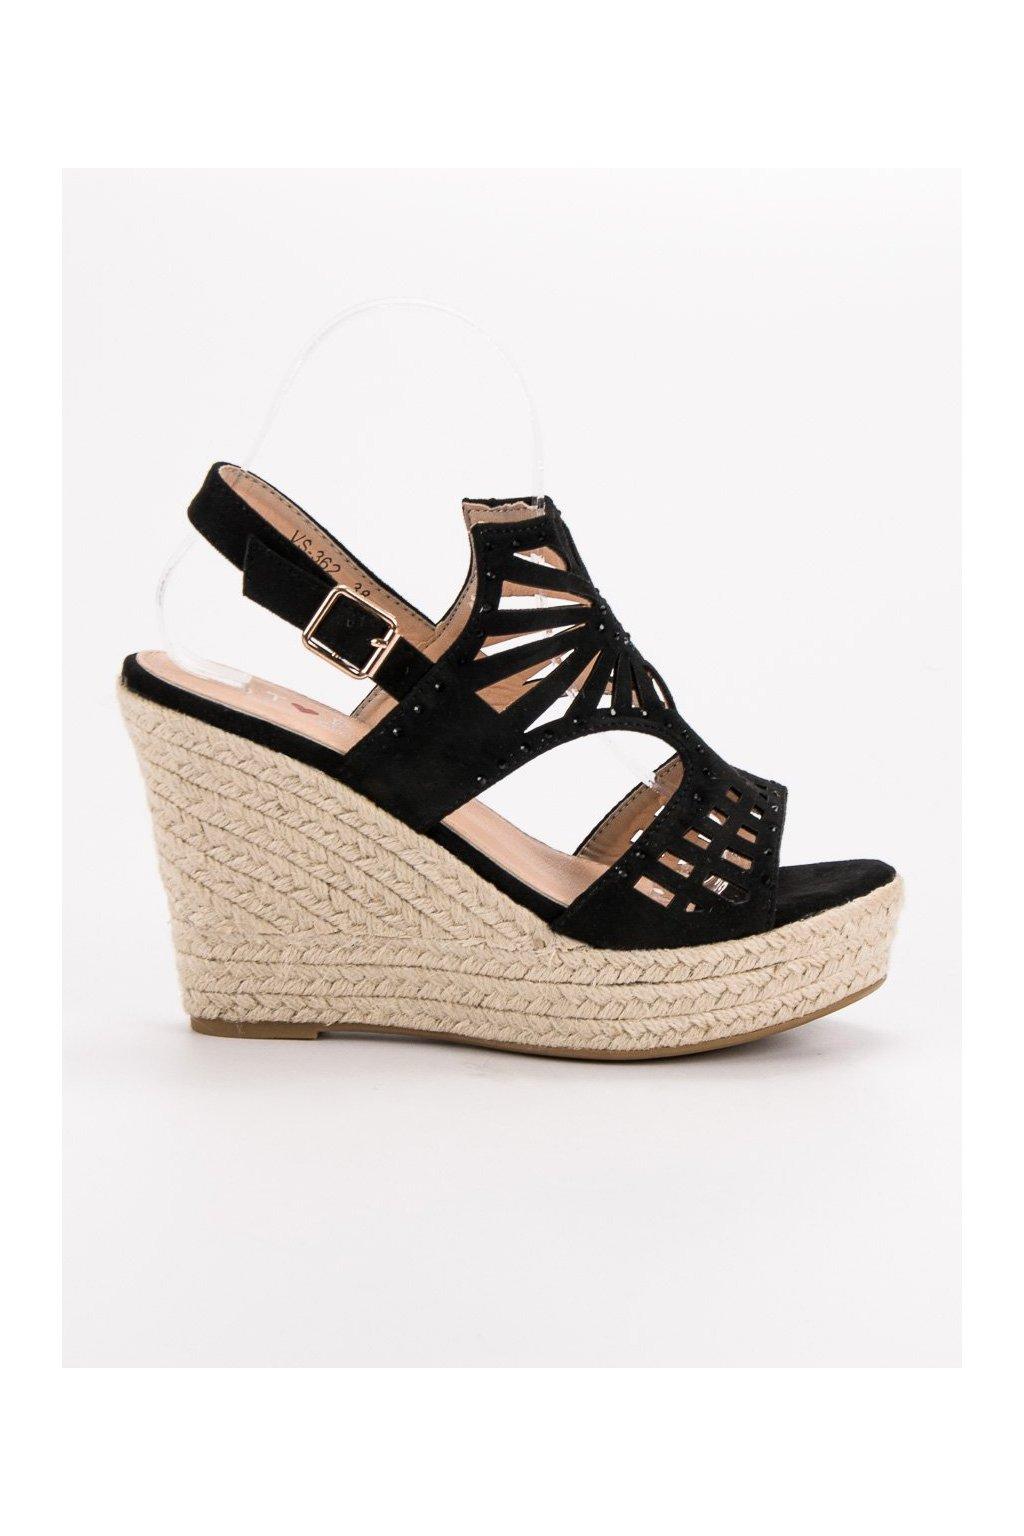 055903ef8b 1053861-4 cierne-sandale-na-klinovom-opatku-top-shoes.jpg 5c5cbd7f